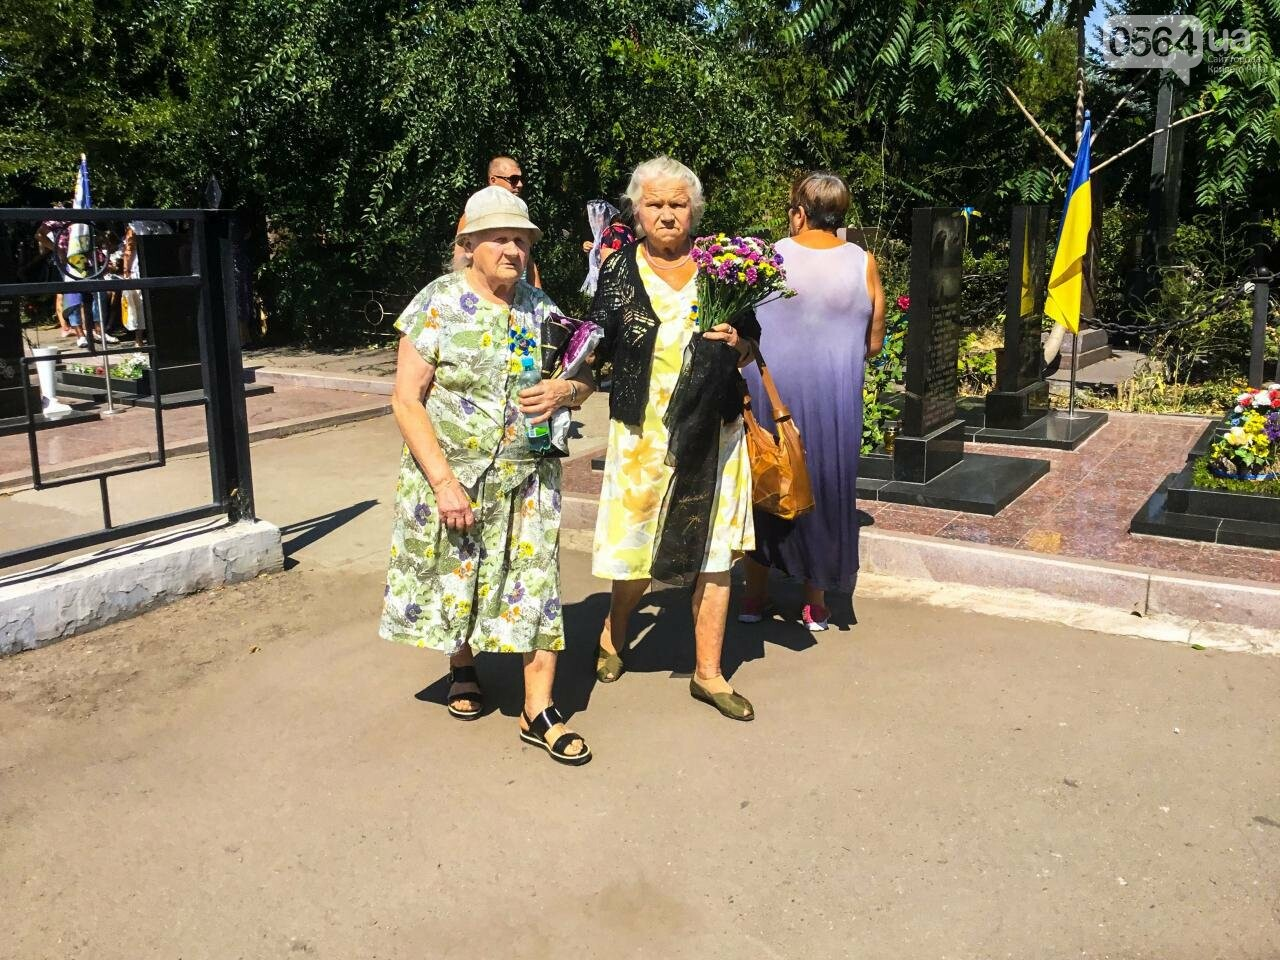 На Аллее Героев провели панихиду по погибшим в зоне АТО криворожанам, - ФОТО , фото-10